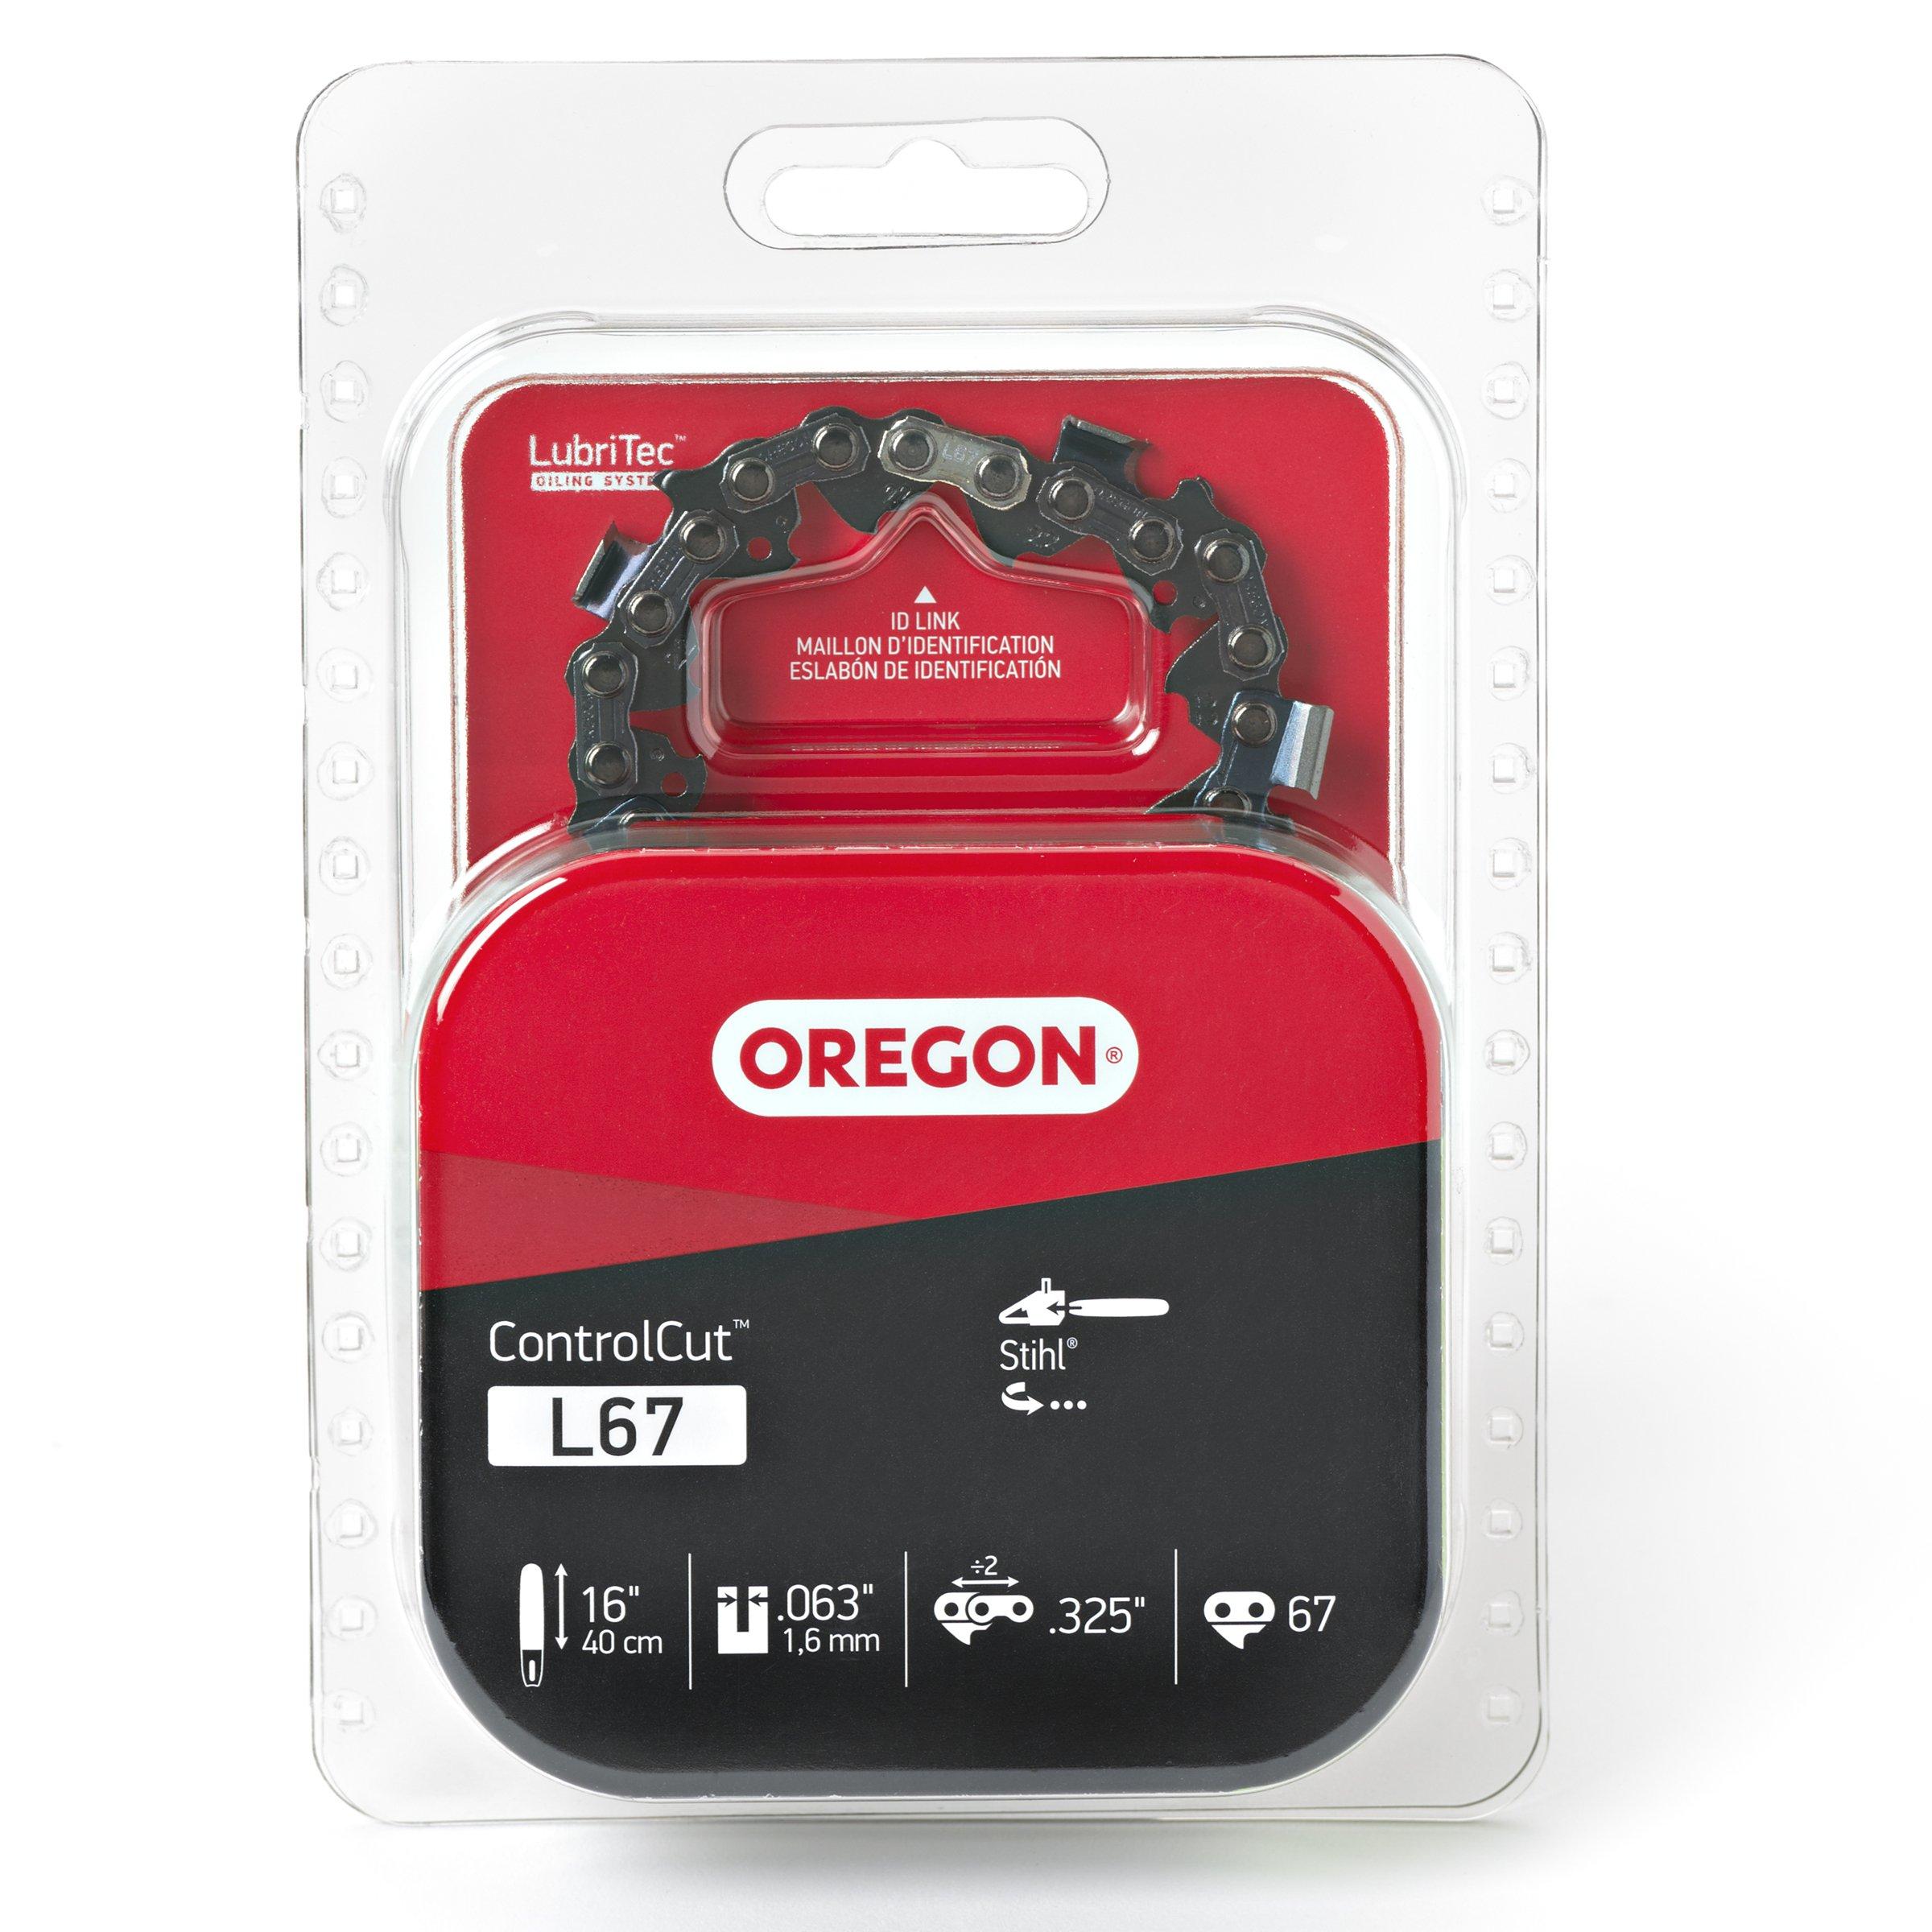 Oregon L67 ControlCut 16-Inch Chainsaw Chain, Fits Stihl by Oregon